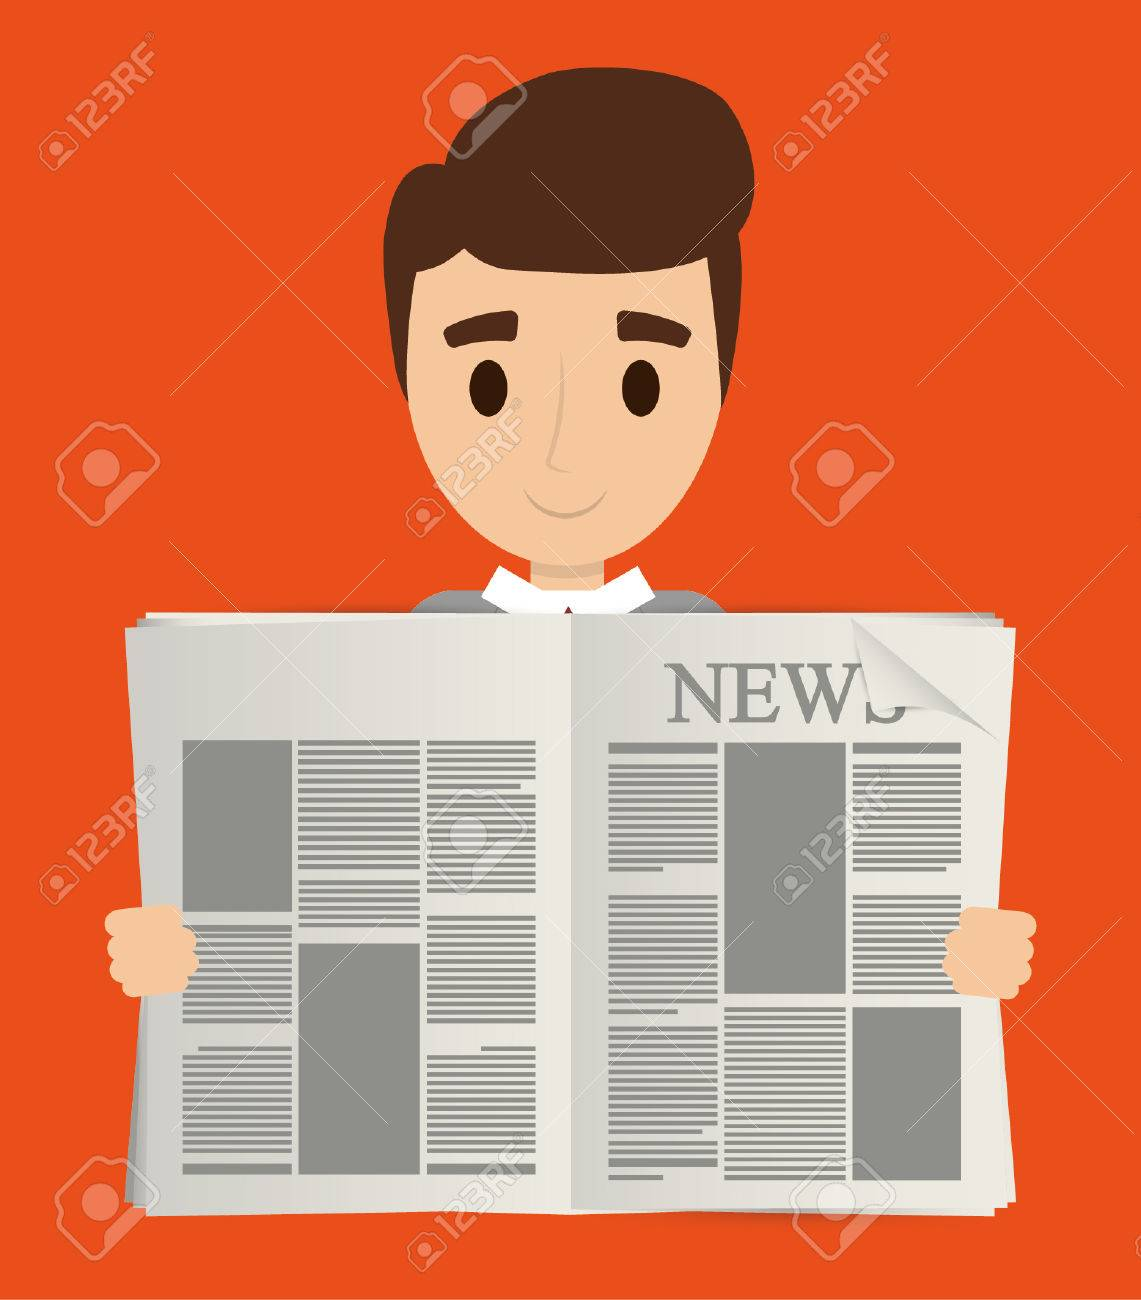 man cartoon reading newspaper icon. news communication and media